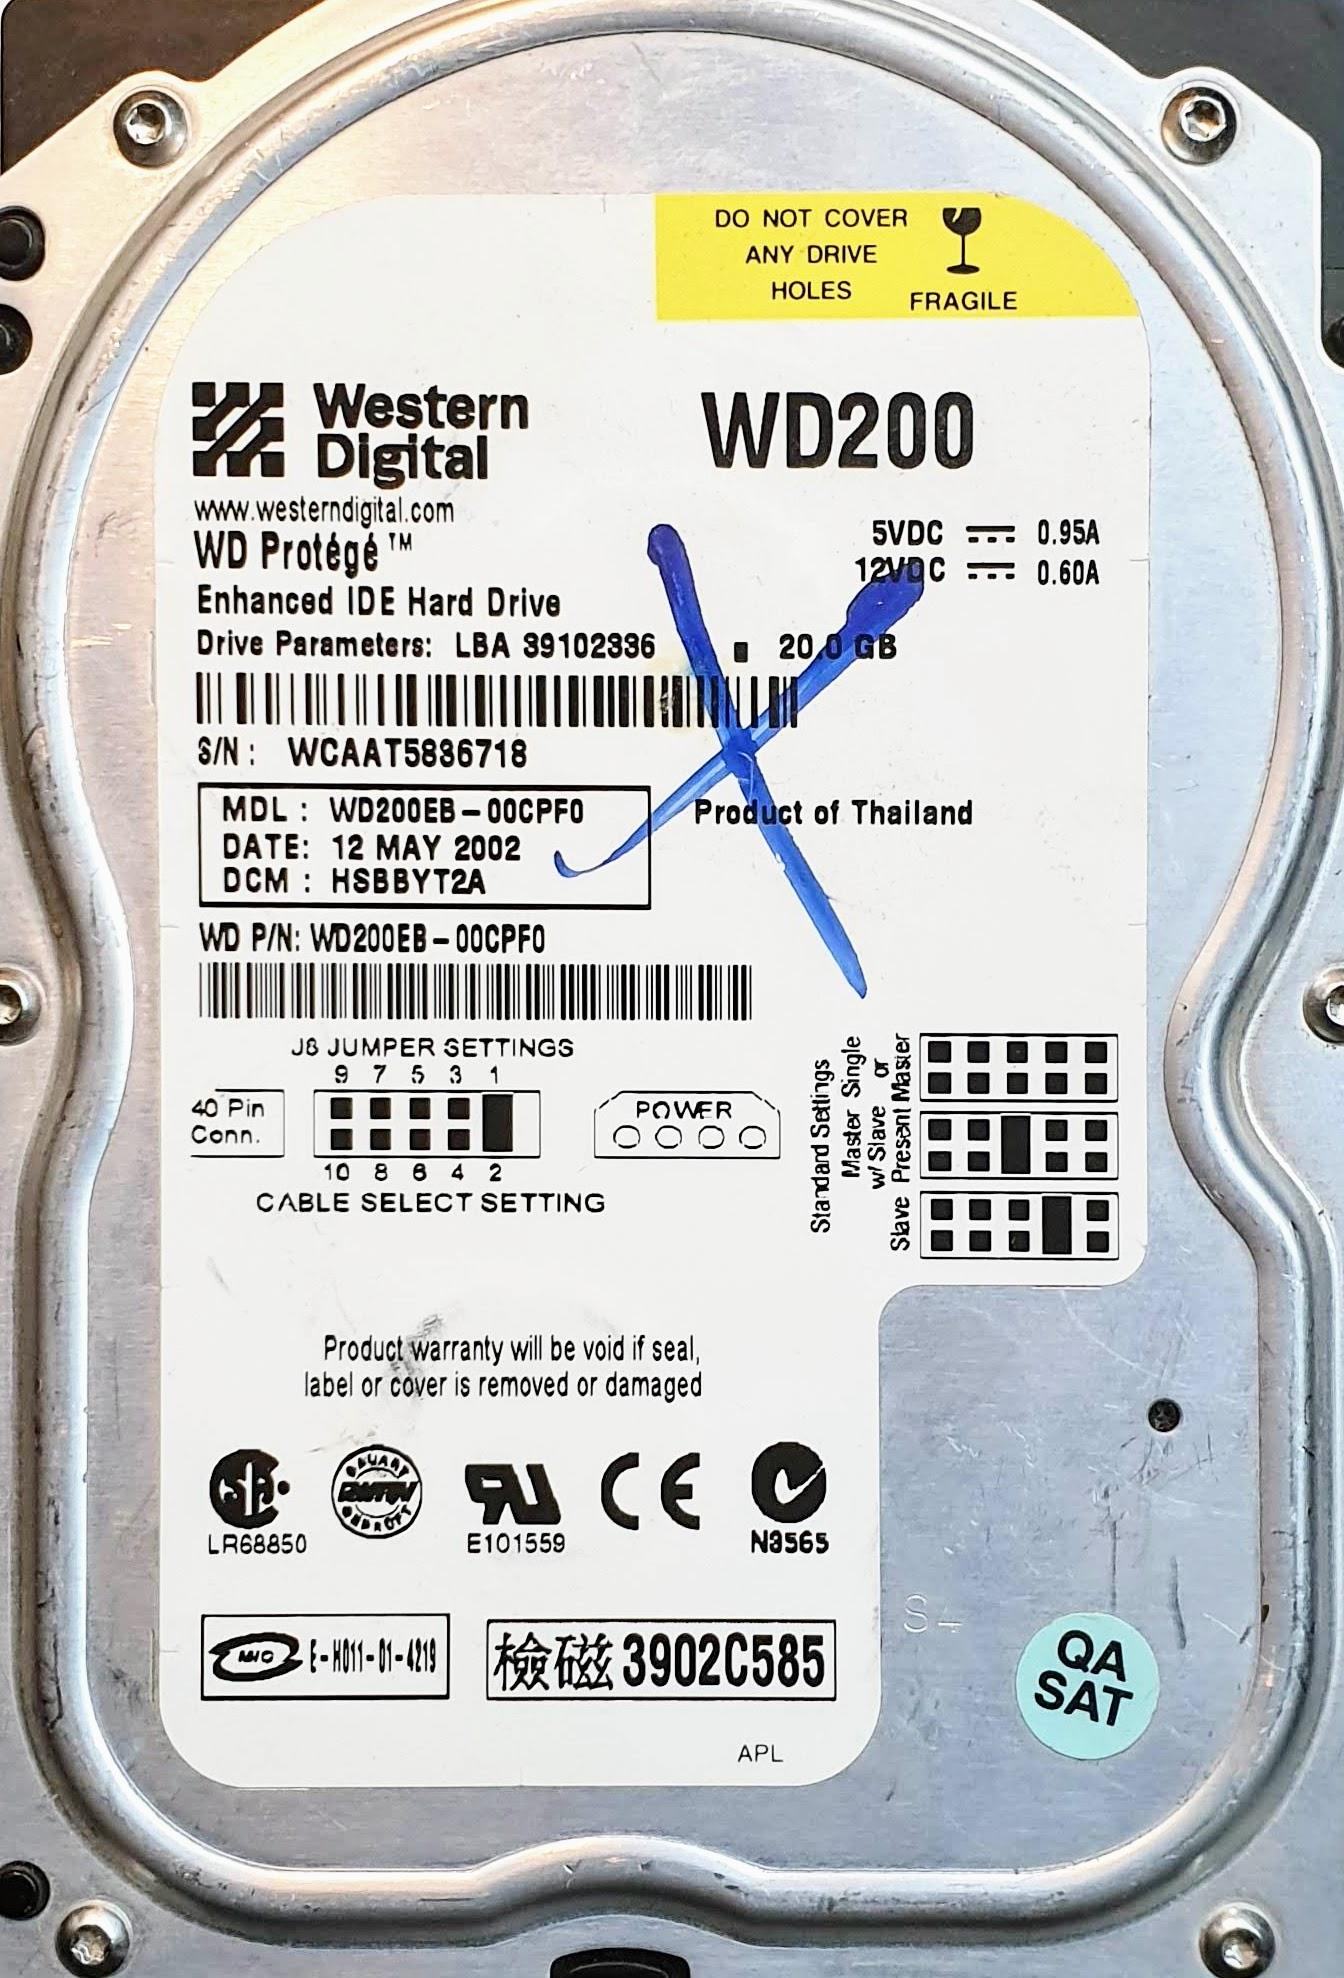 Donor Western Digital Hard Drives and Western Digital PCBs